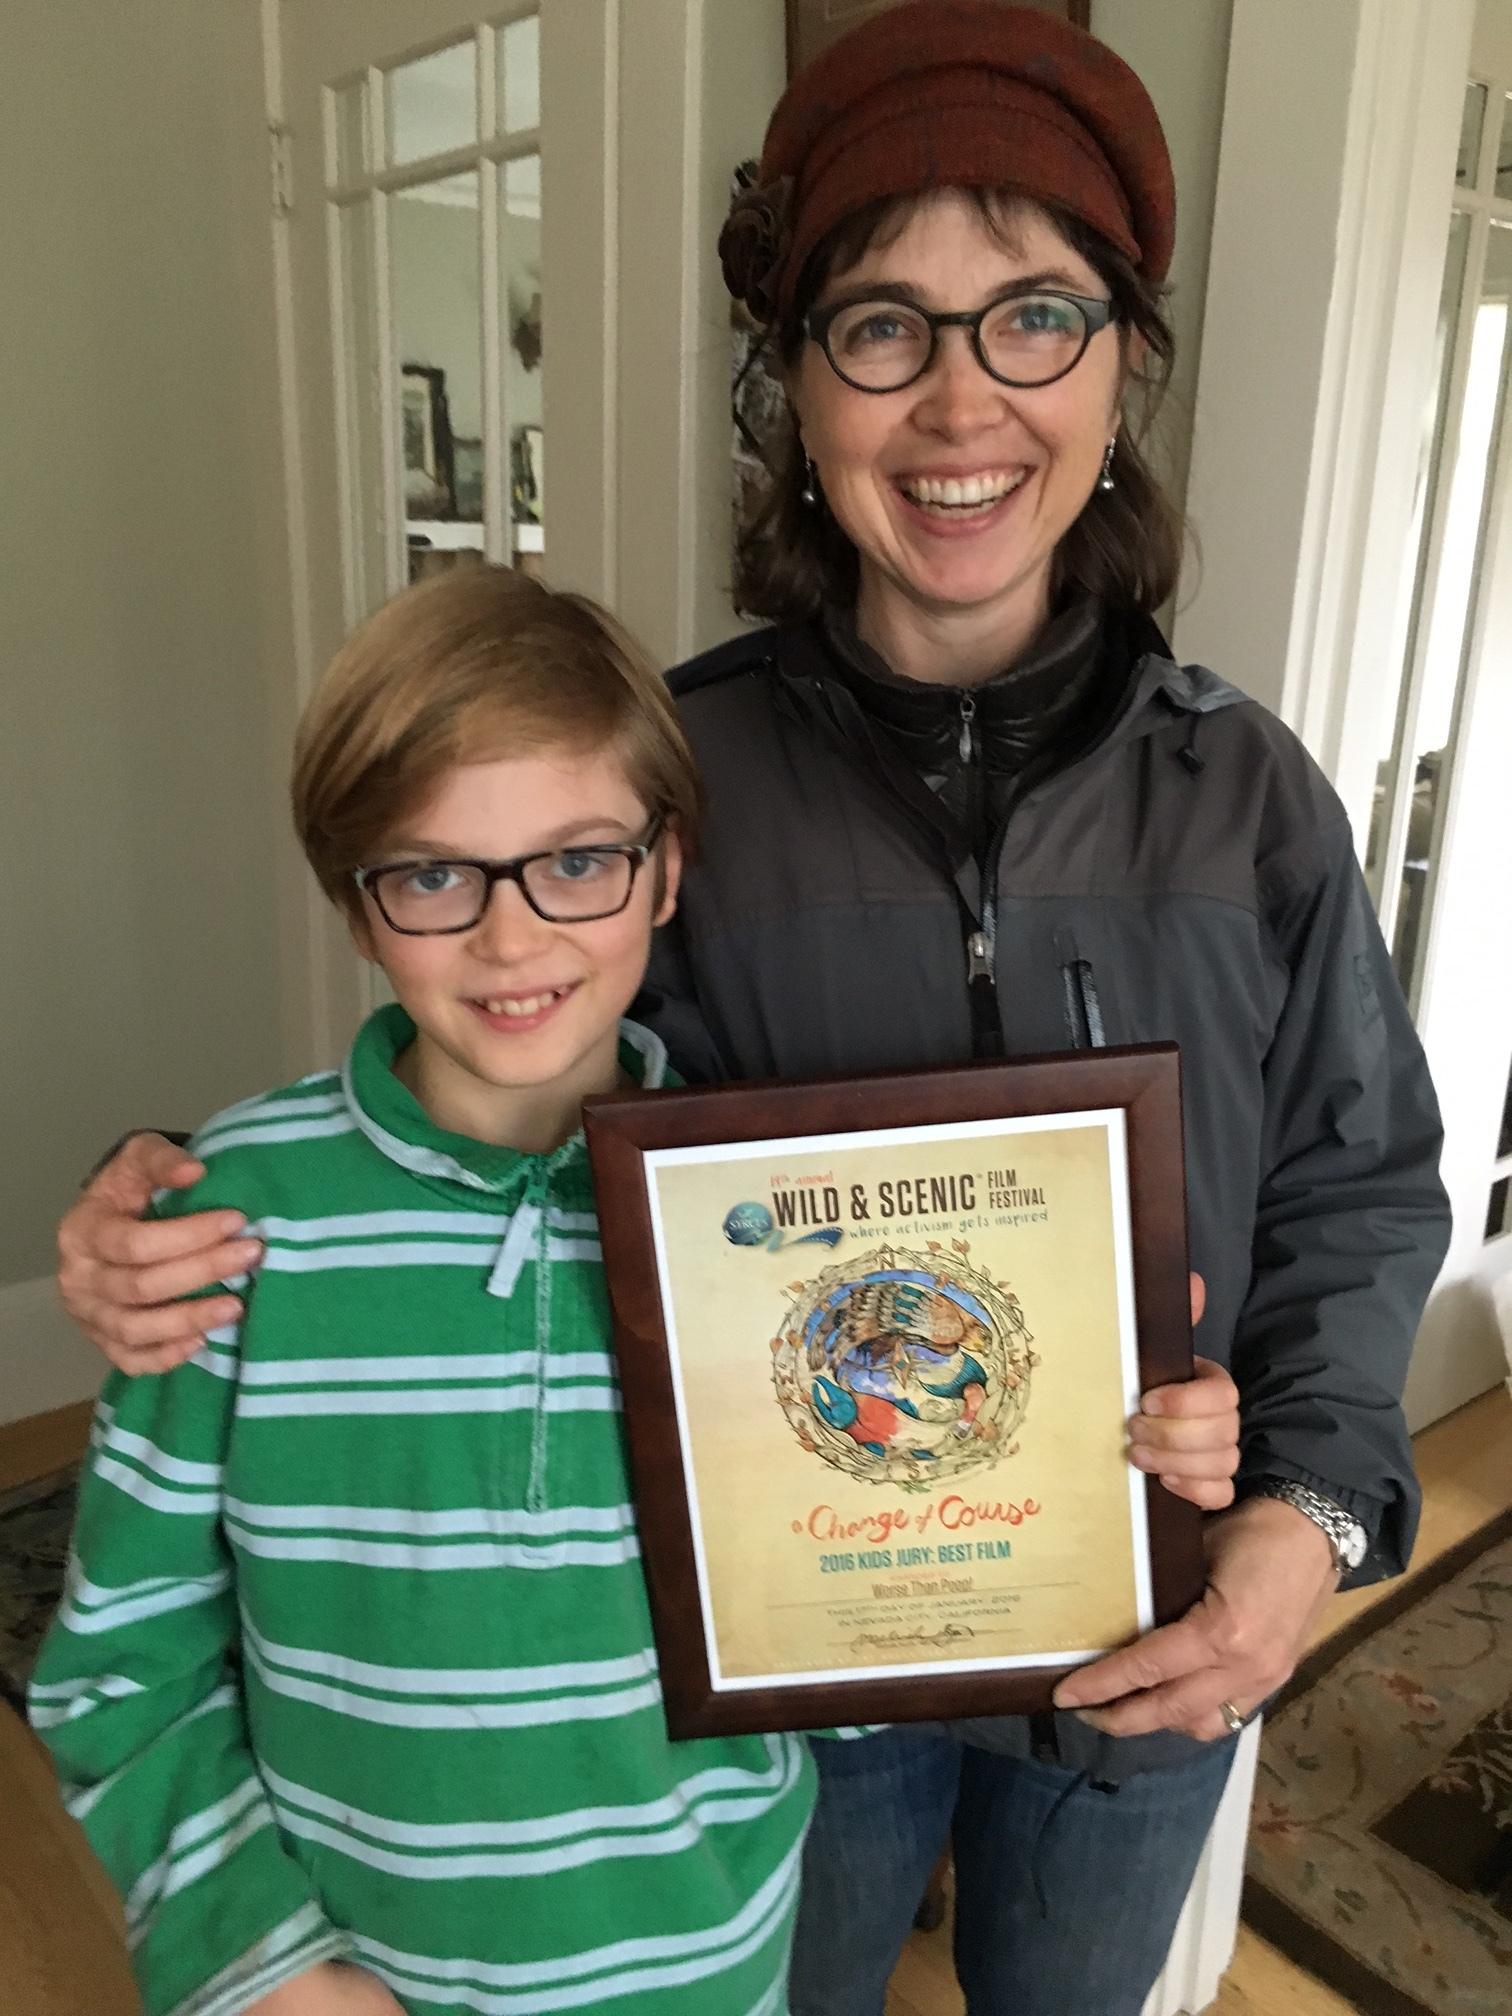 Holding our prize: Kids Jury Award for Best Film, 2016 Wild & Scenic Film Festival